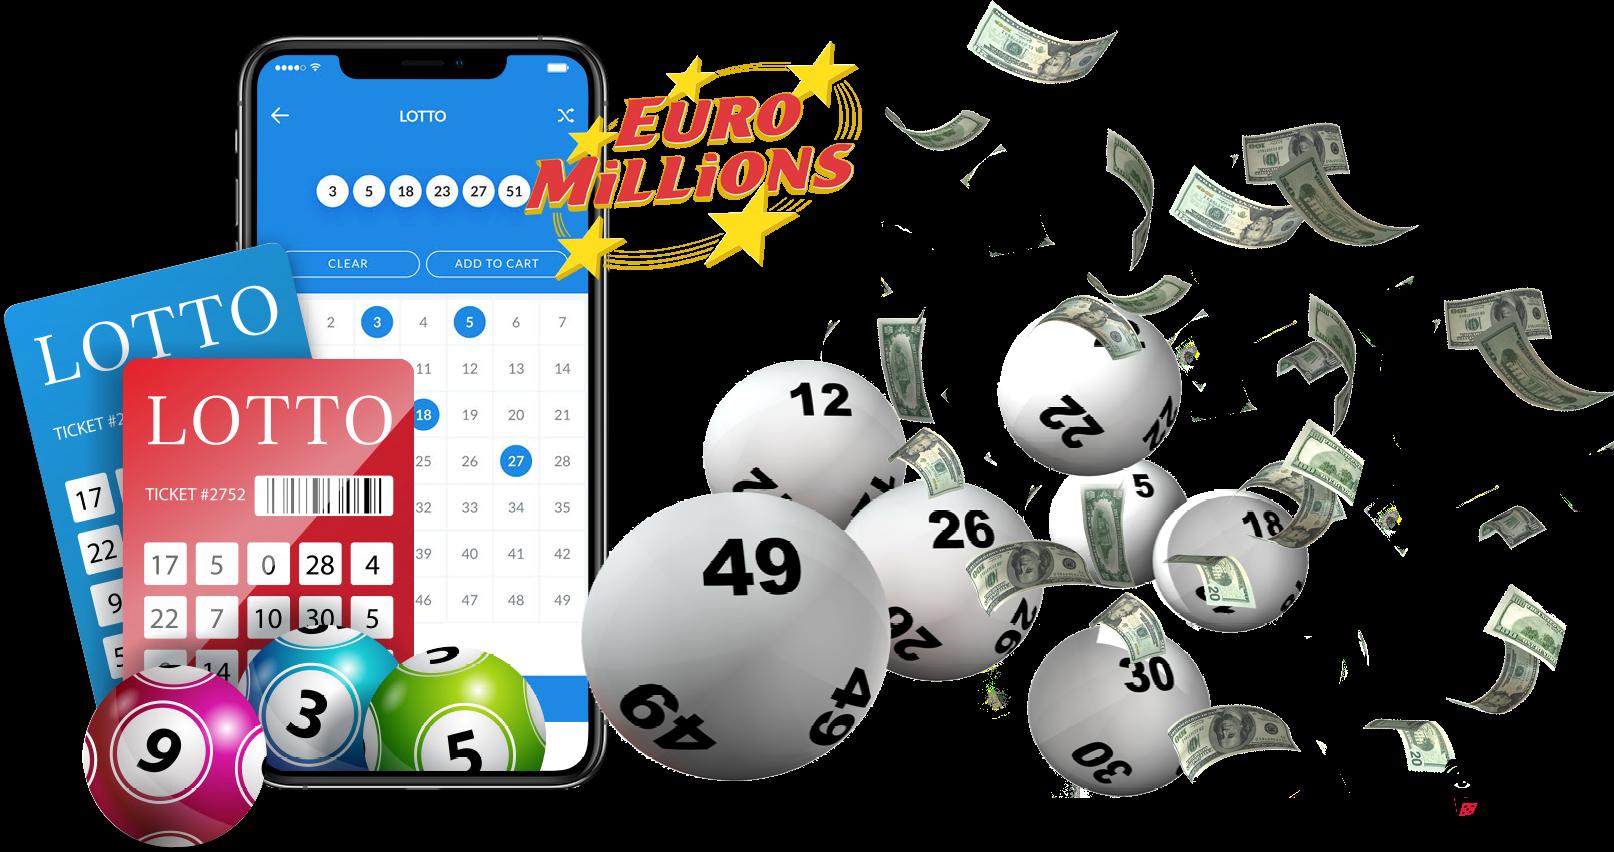 euromillions loterija - bilietai online